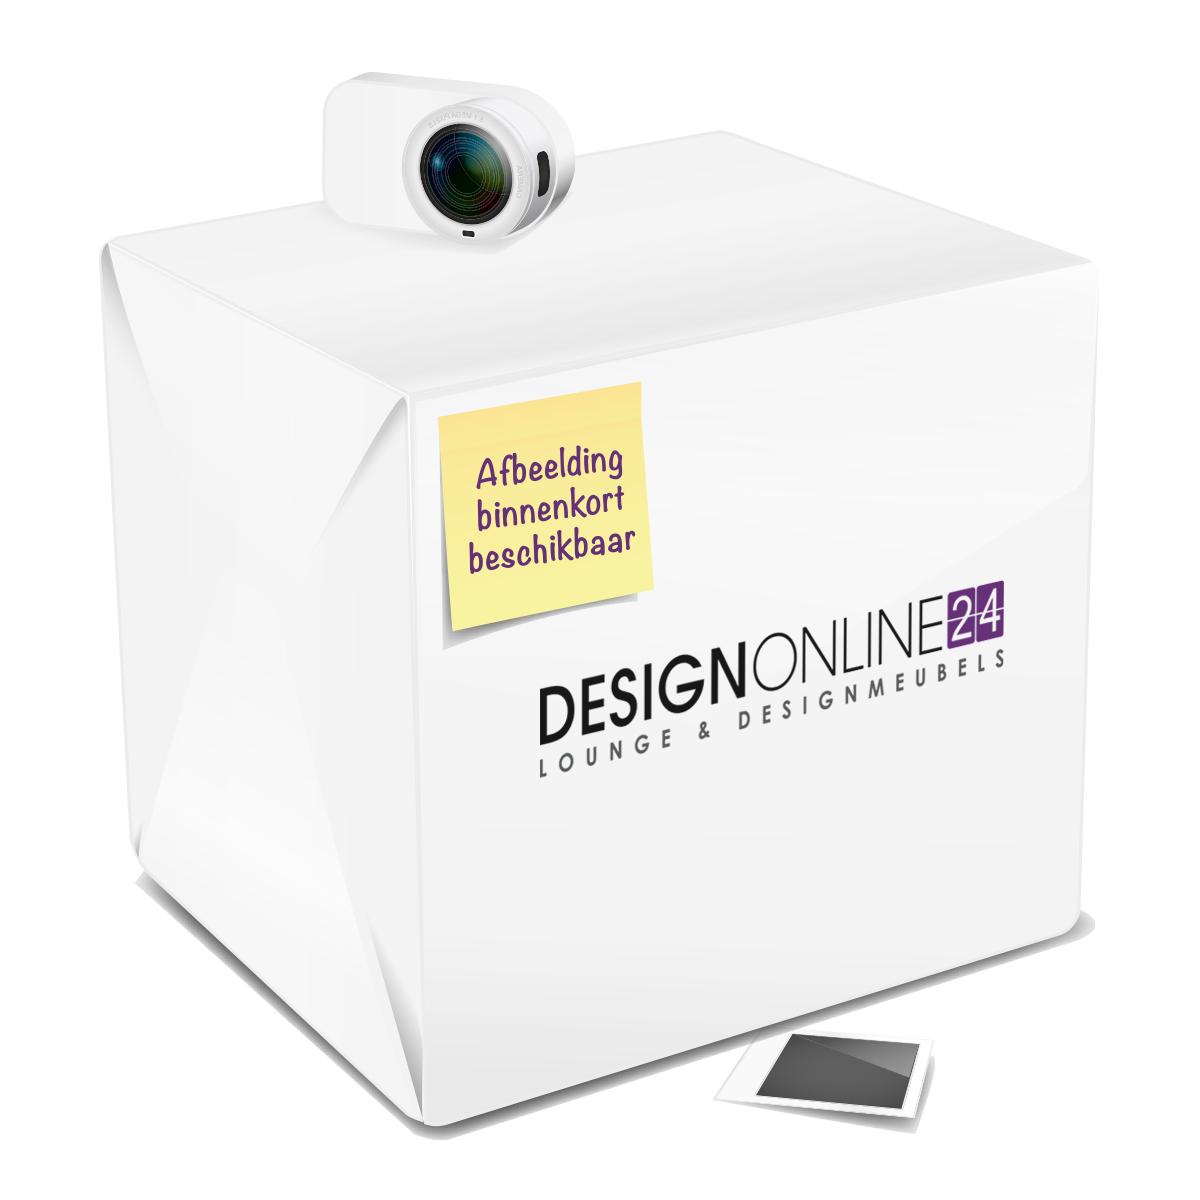 24Designs 24Designs Barkruk Maxime - Zithoogte 77 cm - Chromen onderstel - Kunstleren zitting - Rood